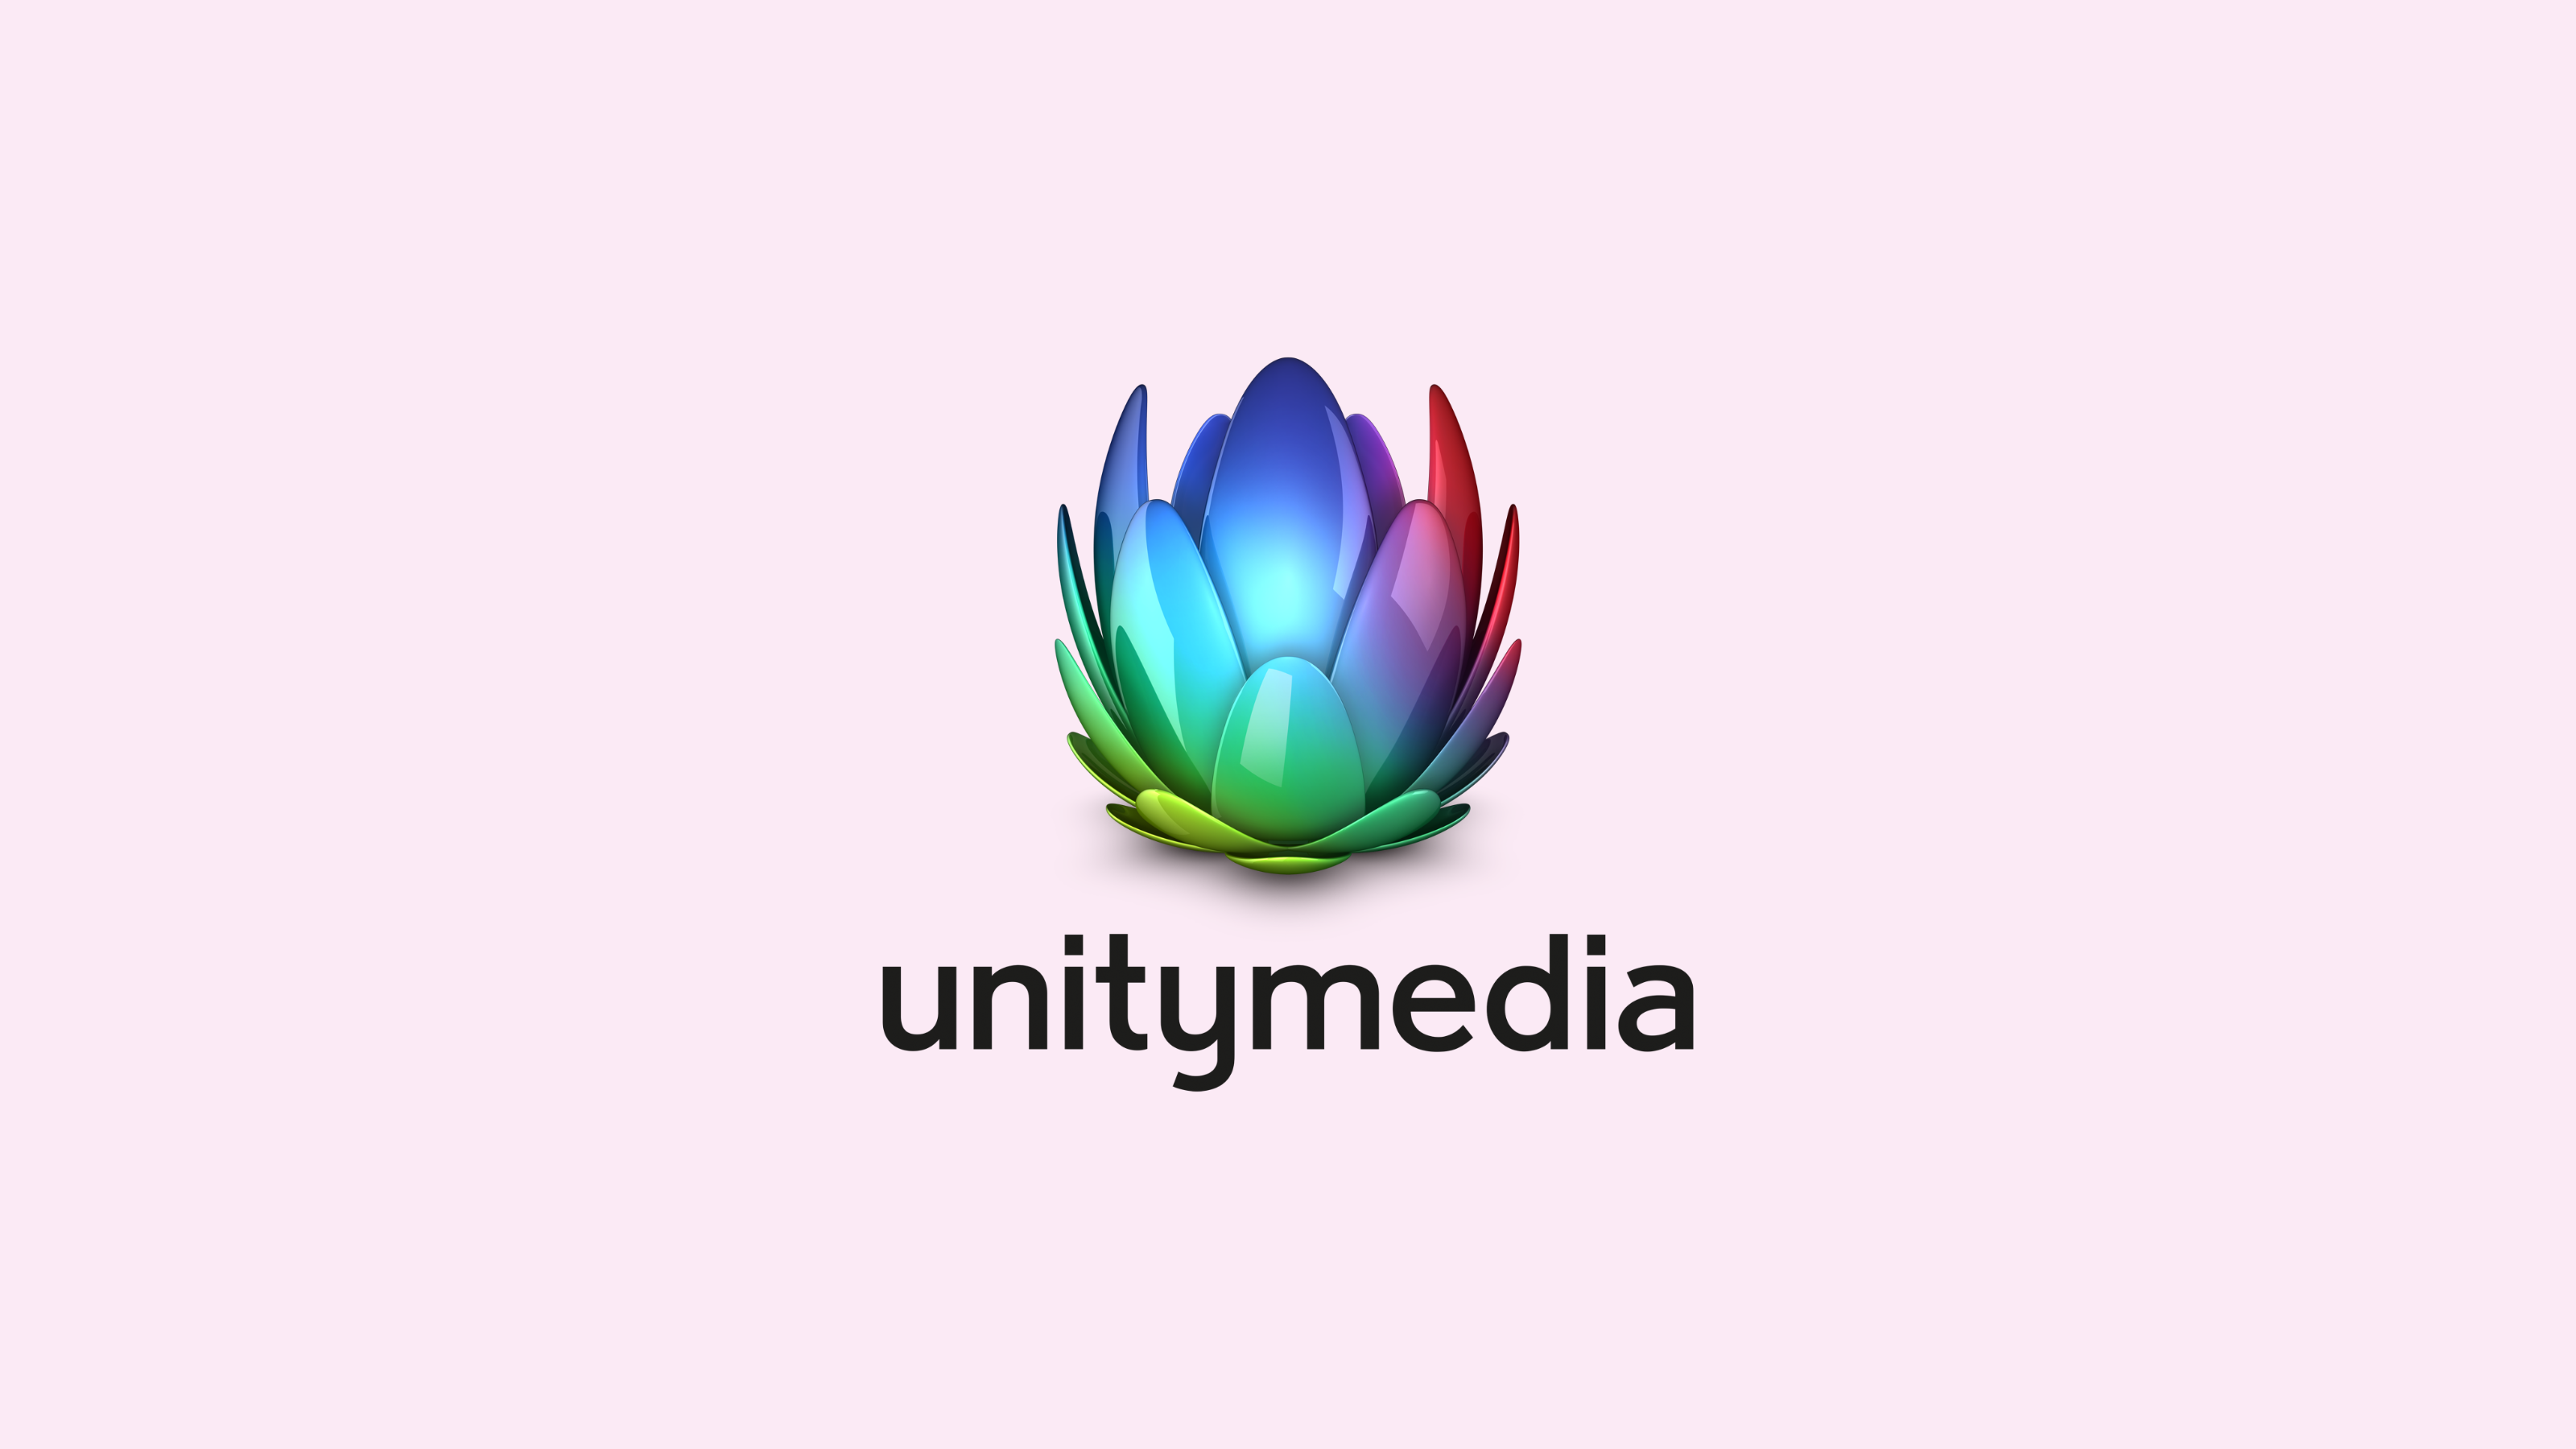 unity media whatsapp notification störungsmelder